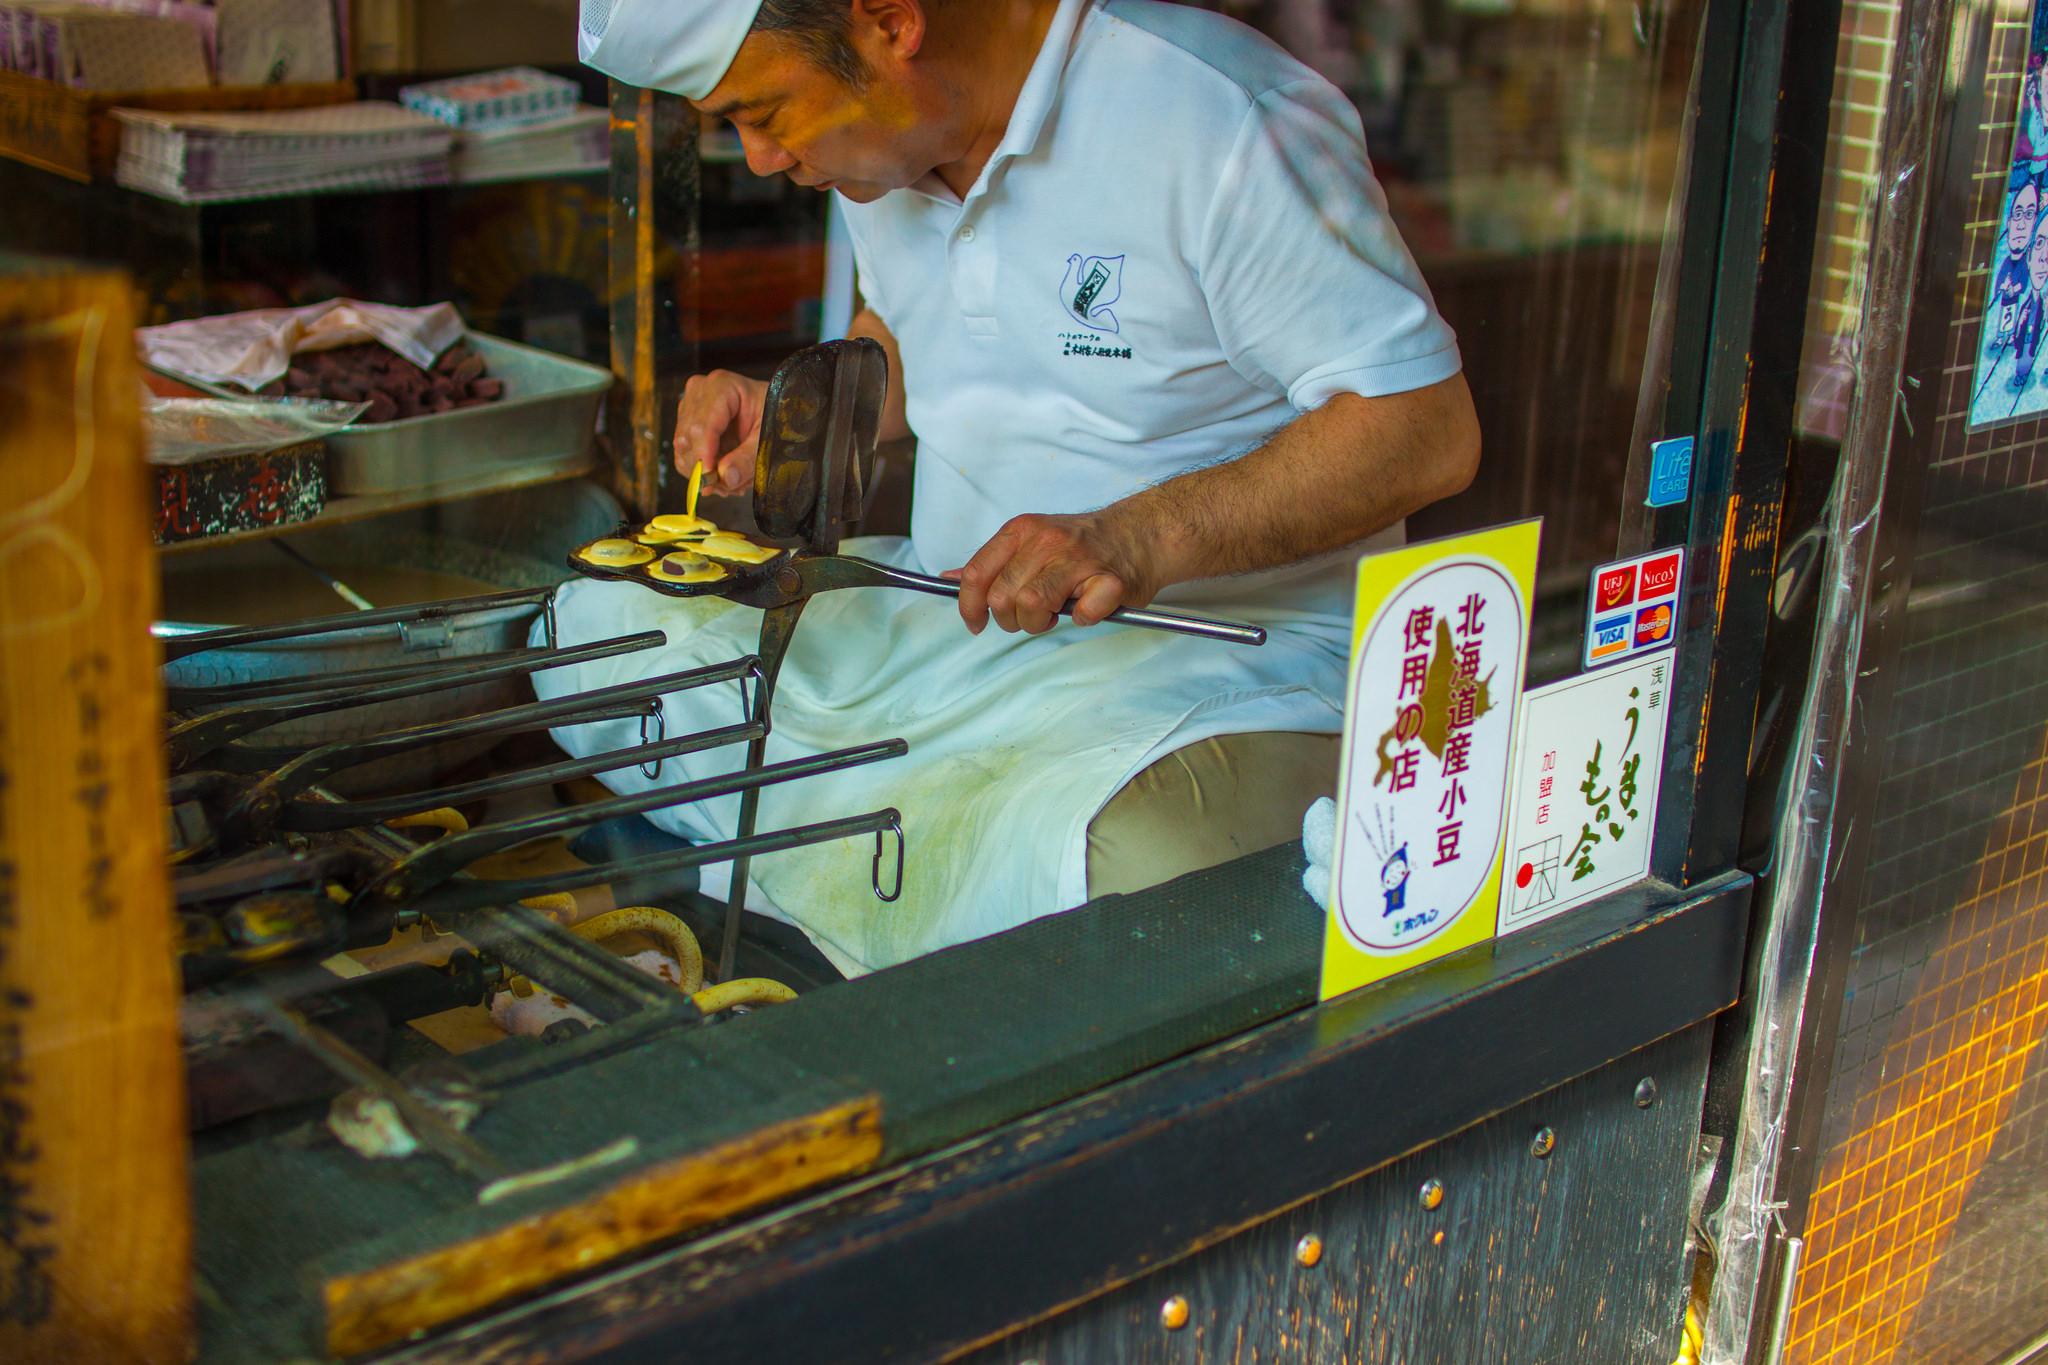 10 Street foods you MUST-EAT Around Nakamise Shopping Street, Asakusa